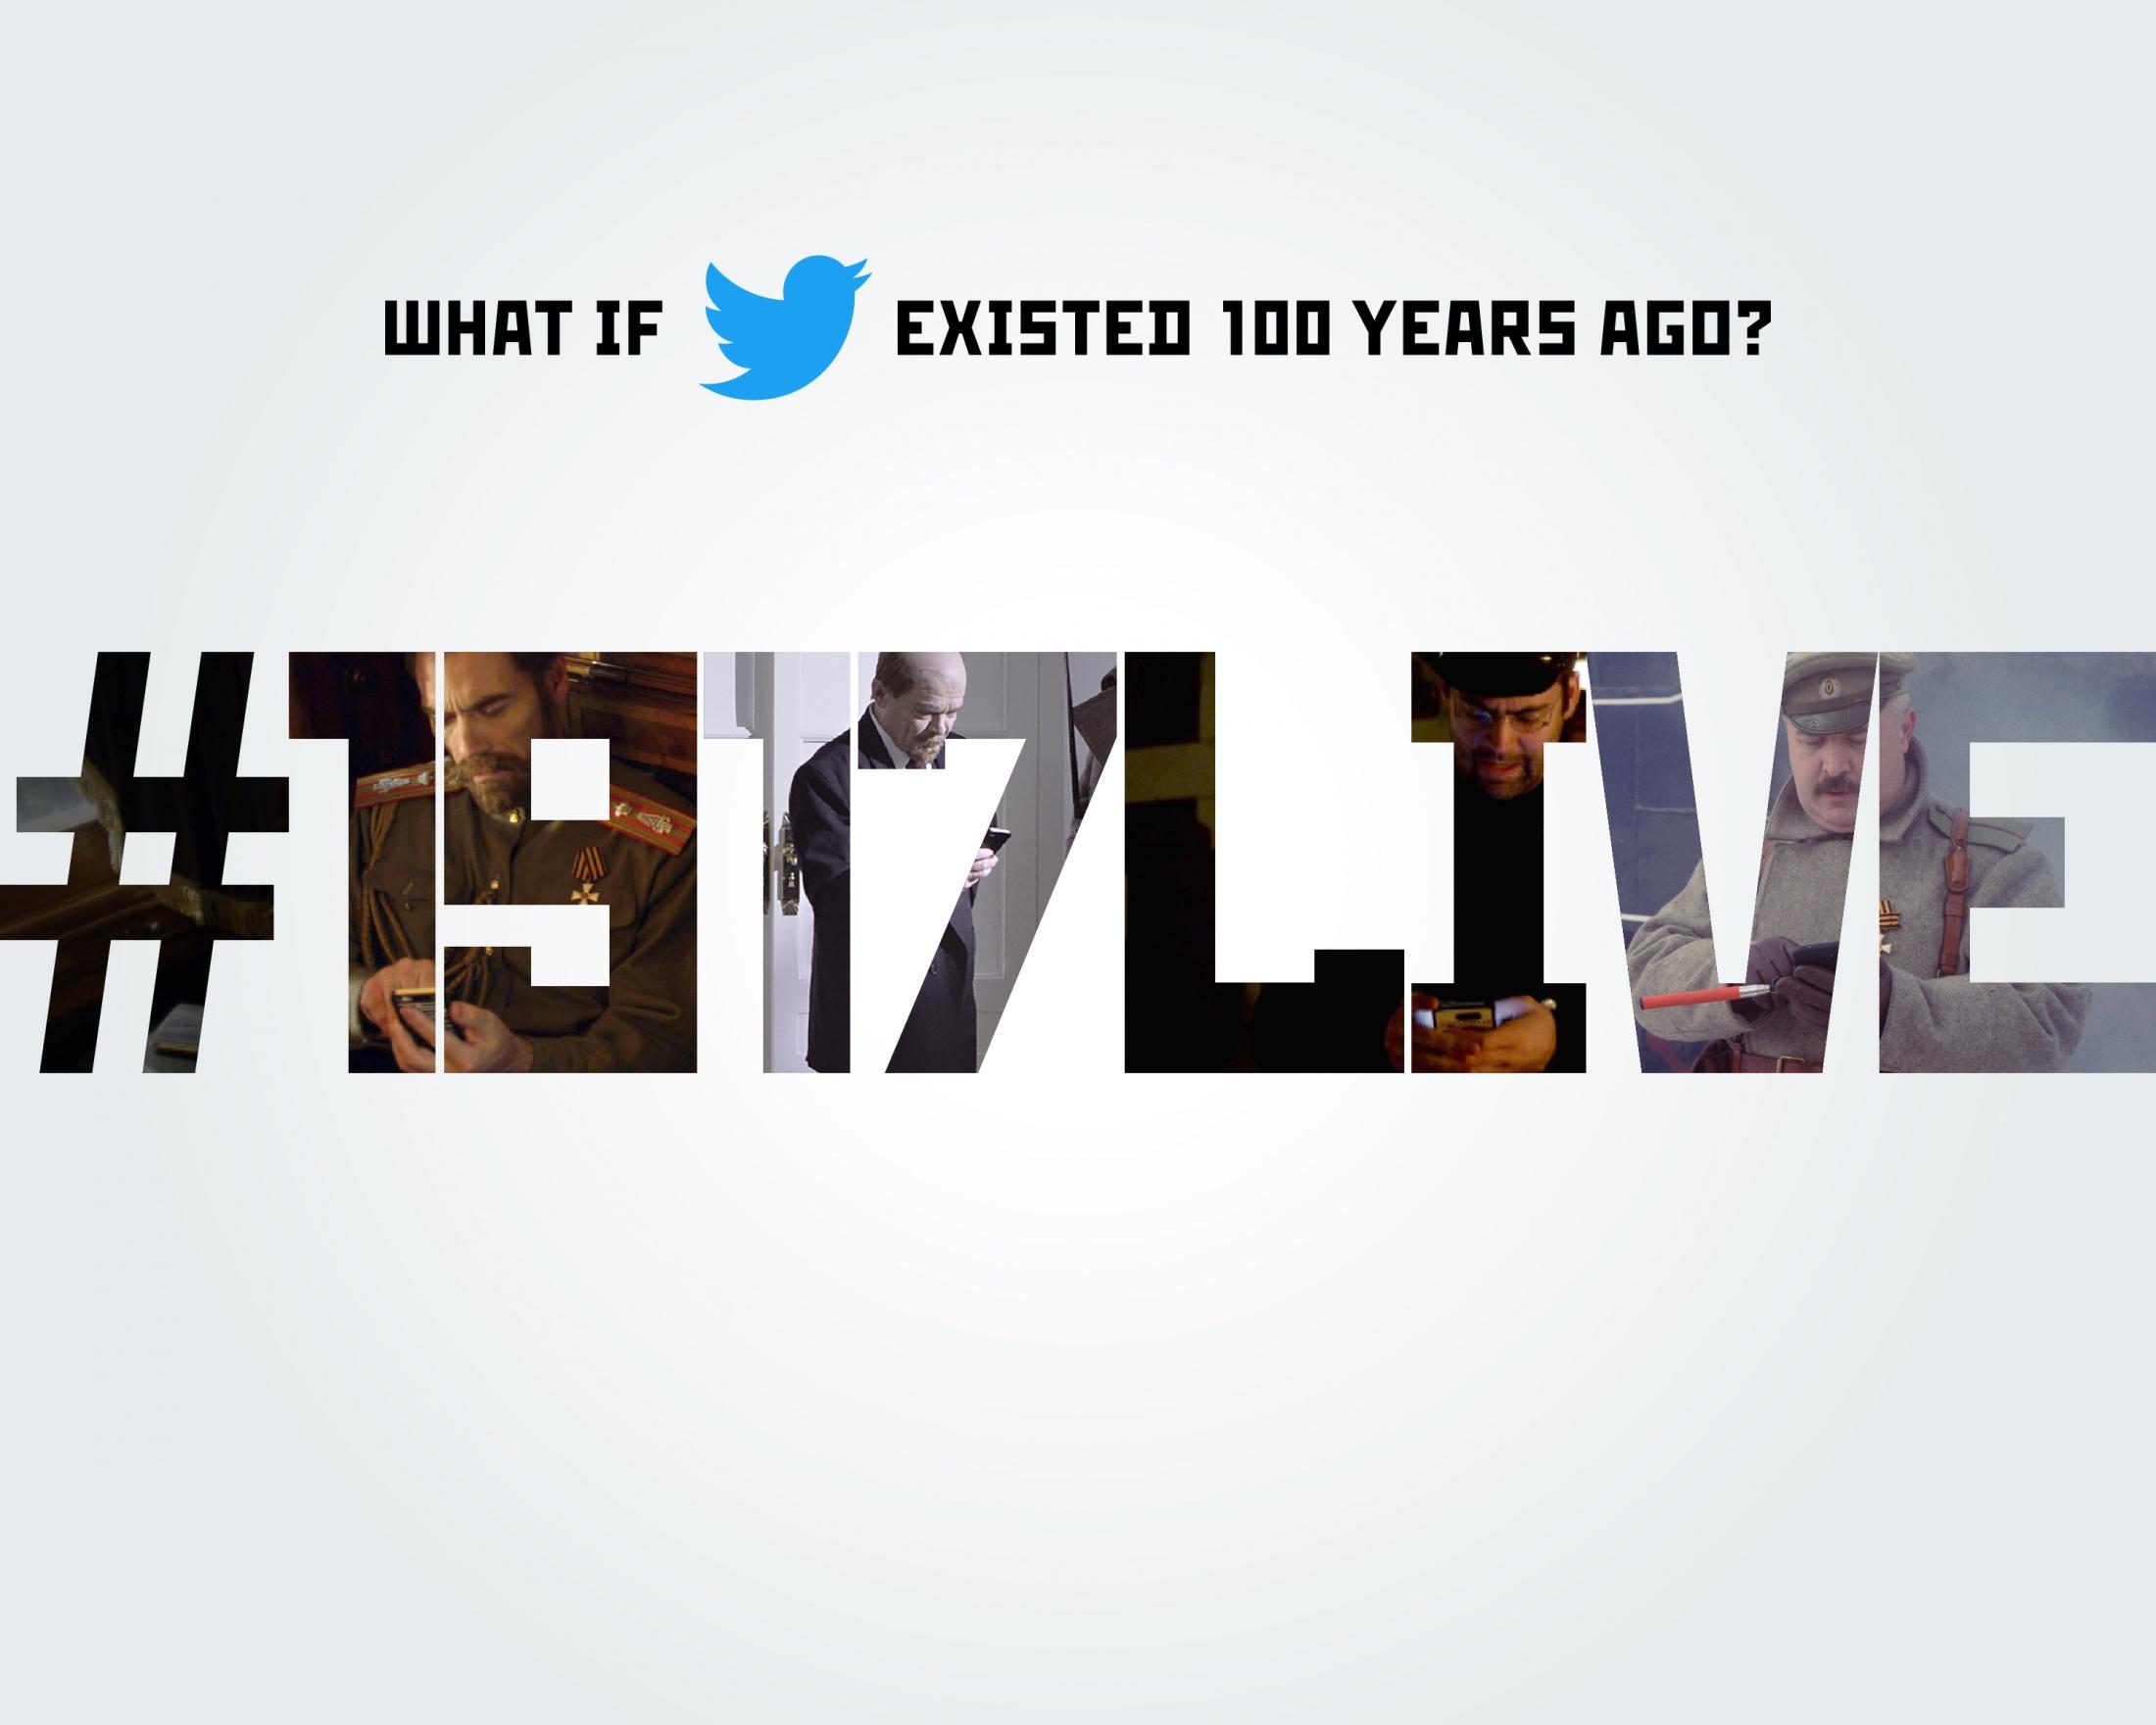 Thumbnail for #1917LIVE: Tsar tweets abdication